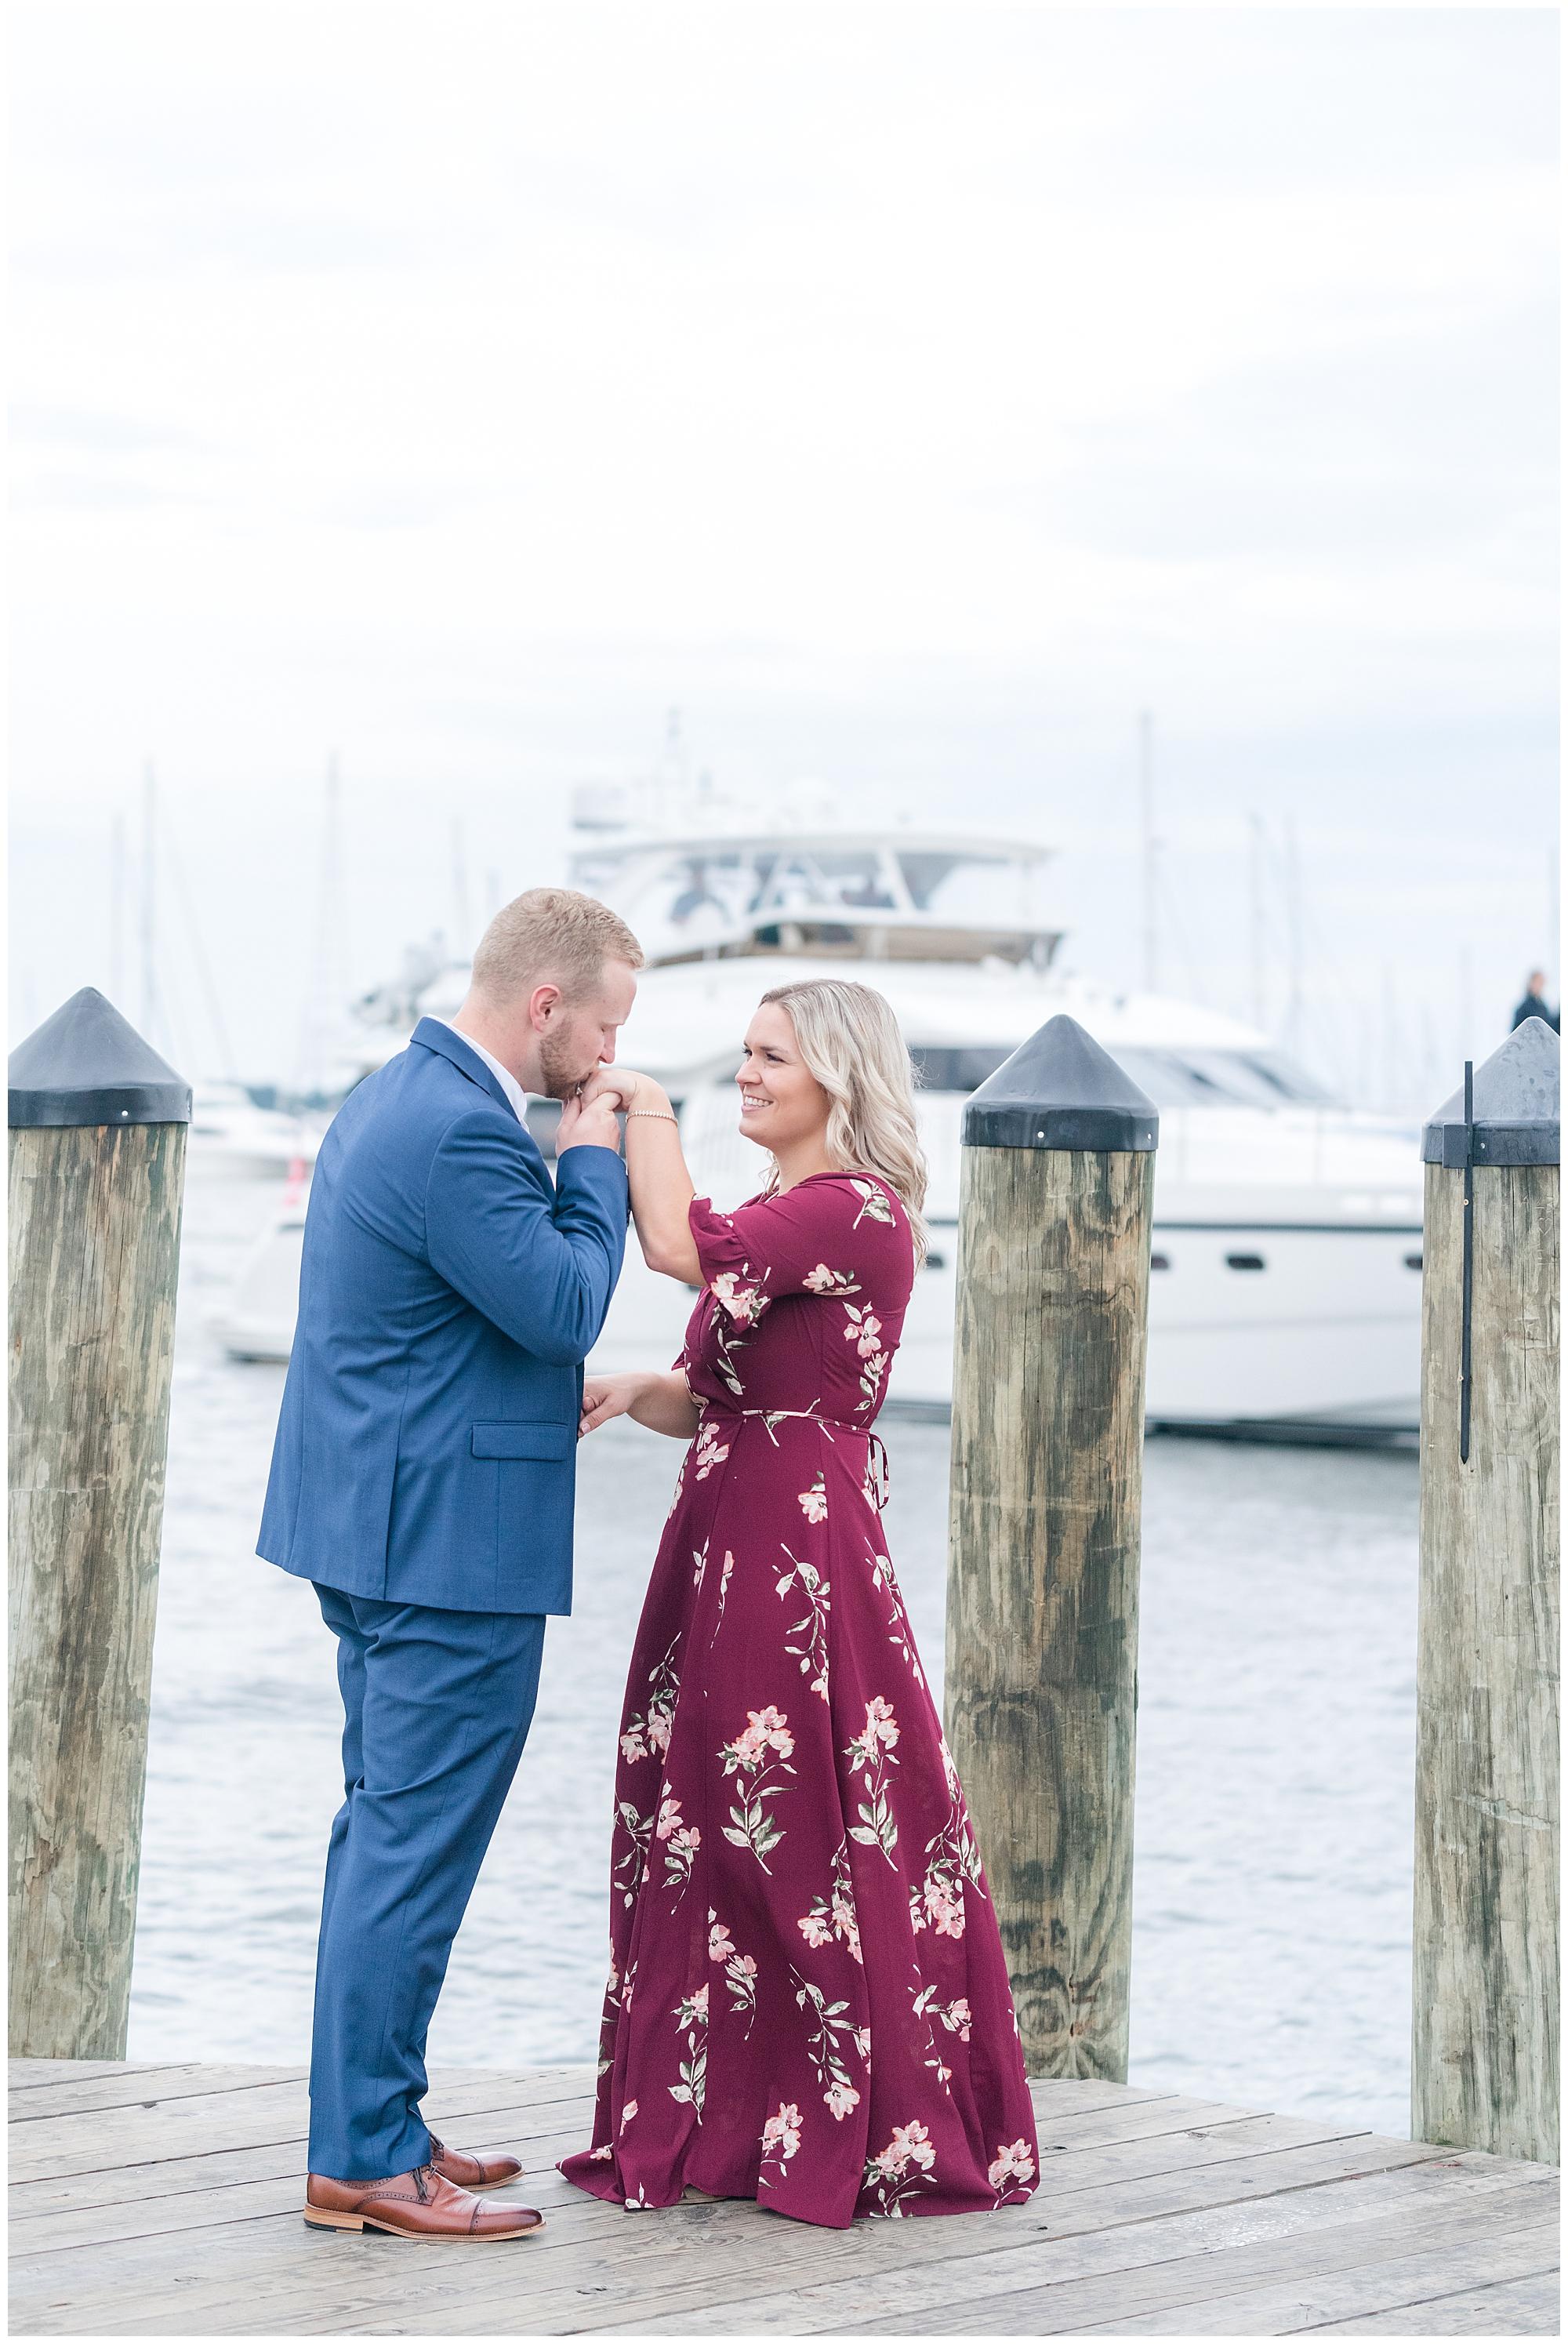 Annapolis engagement session